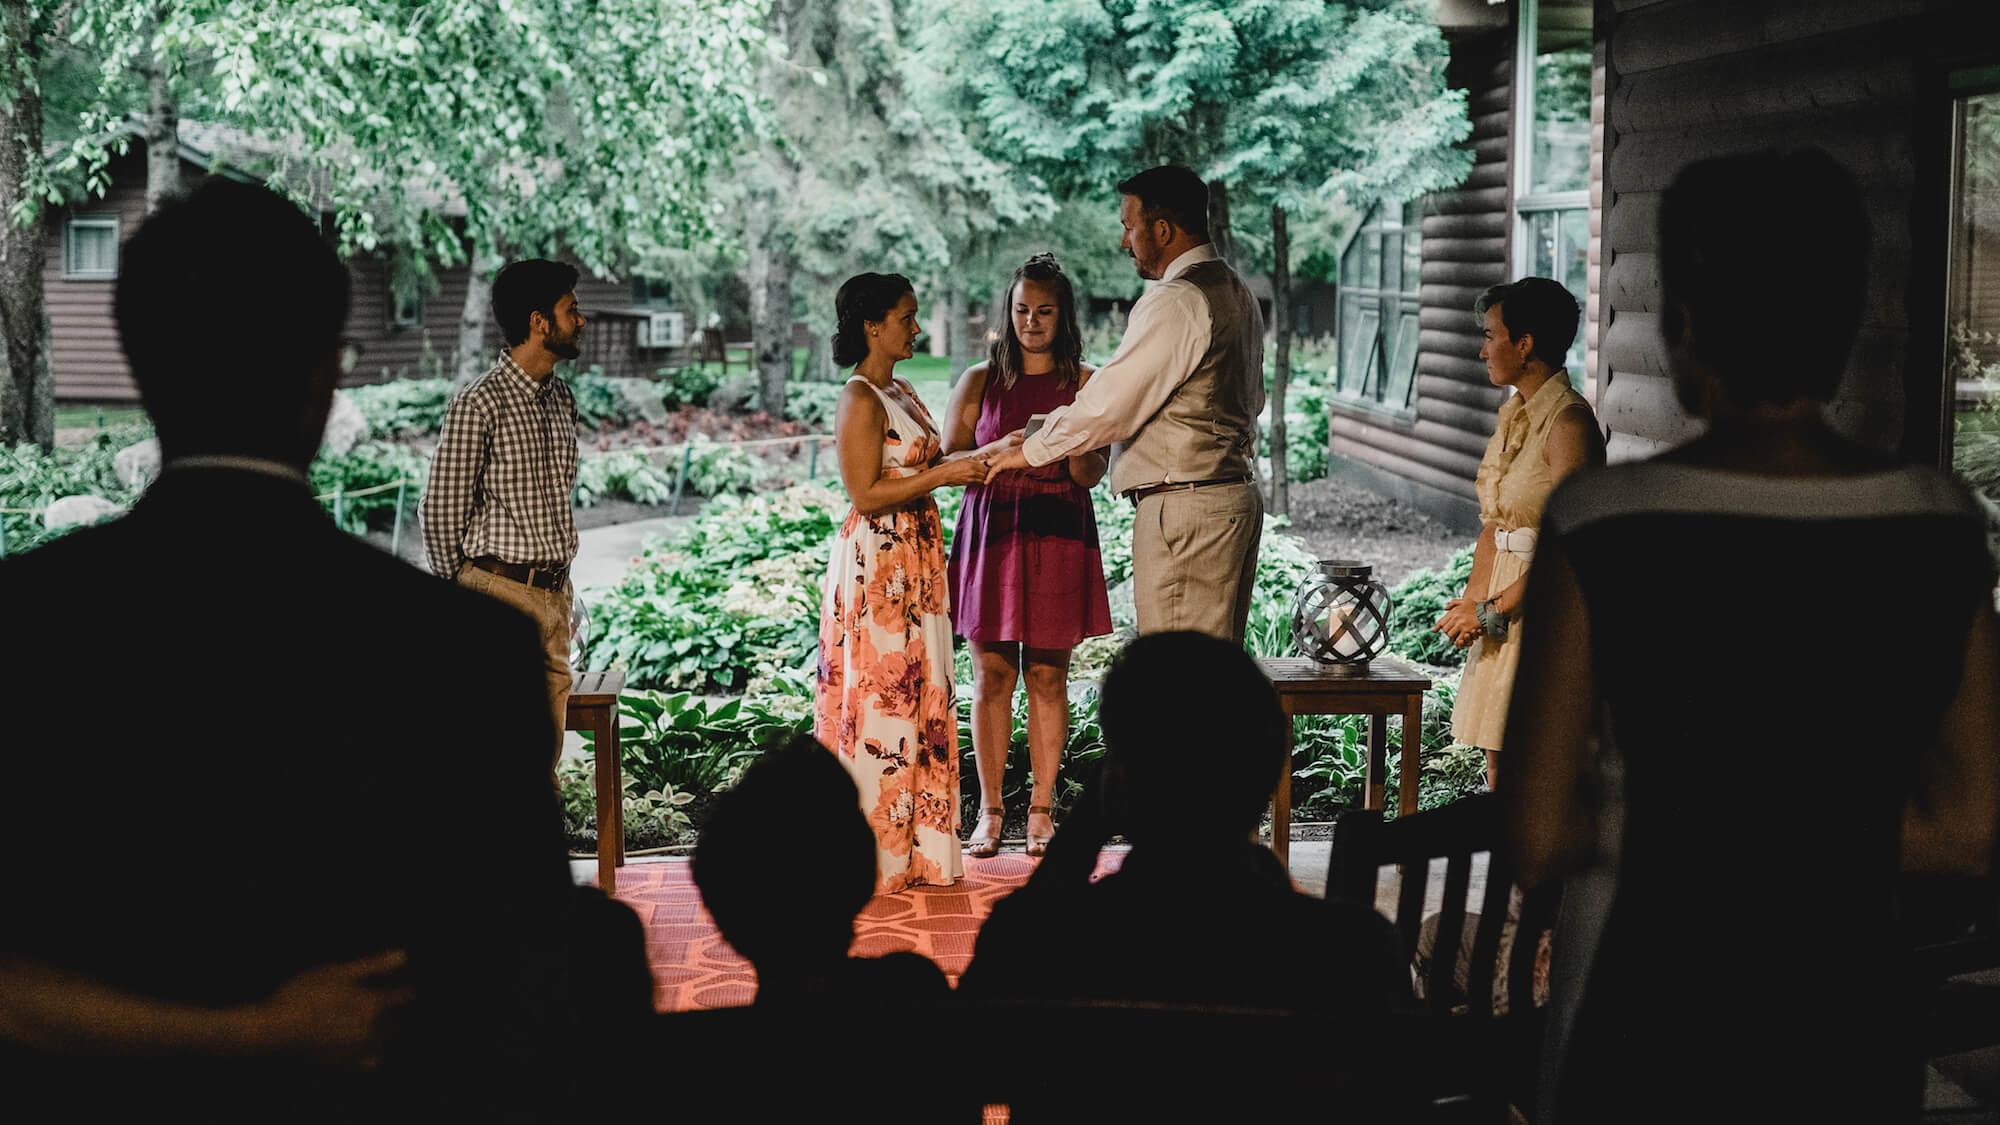 engle-olson-maddy-pat-mn-wedding-photography-20.jpg